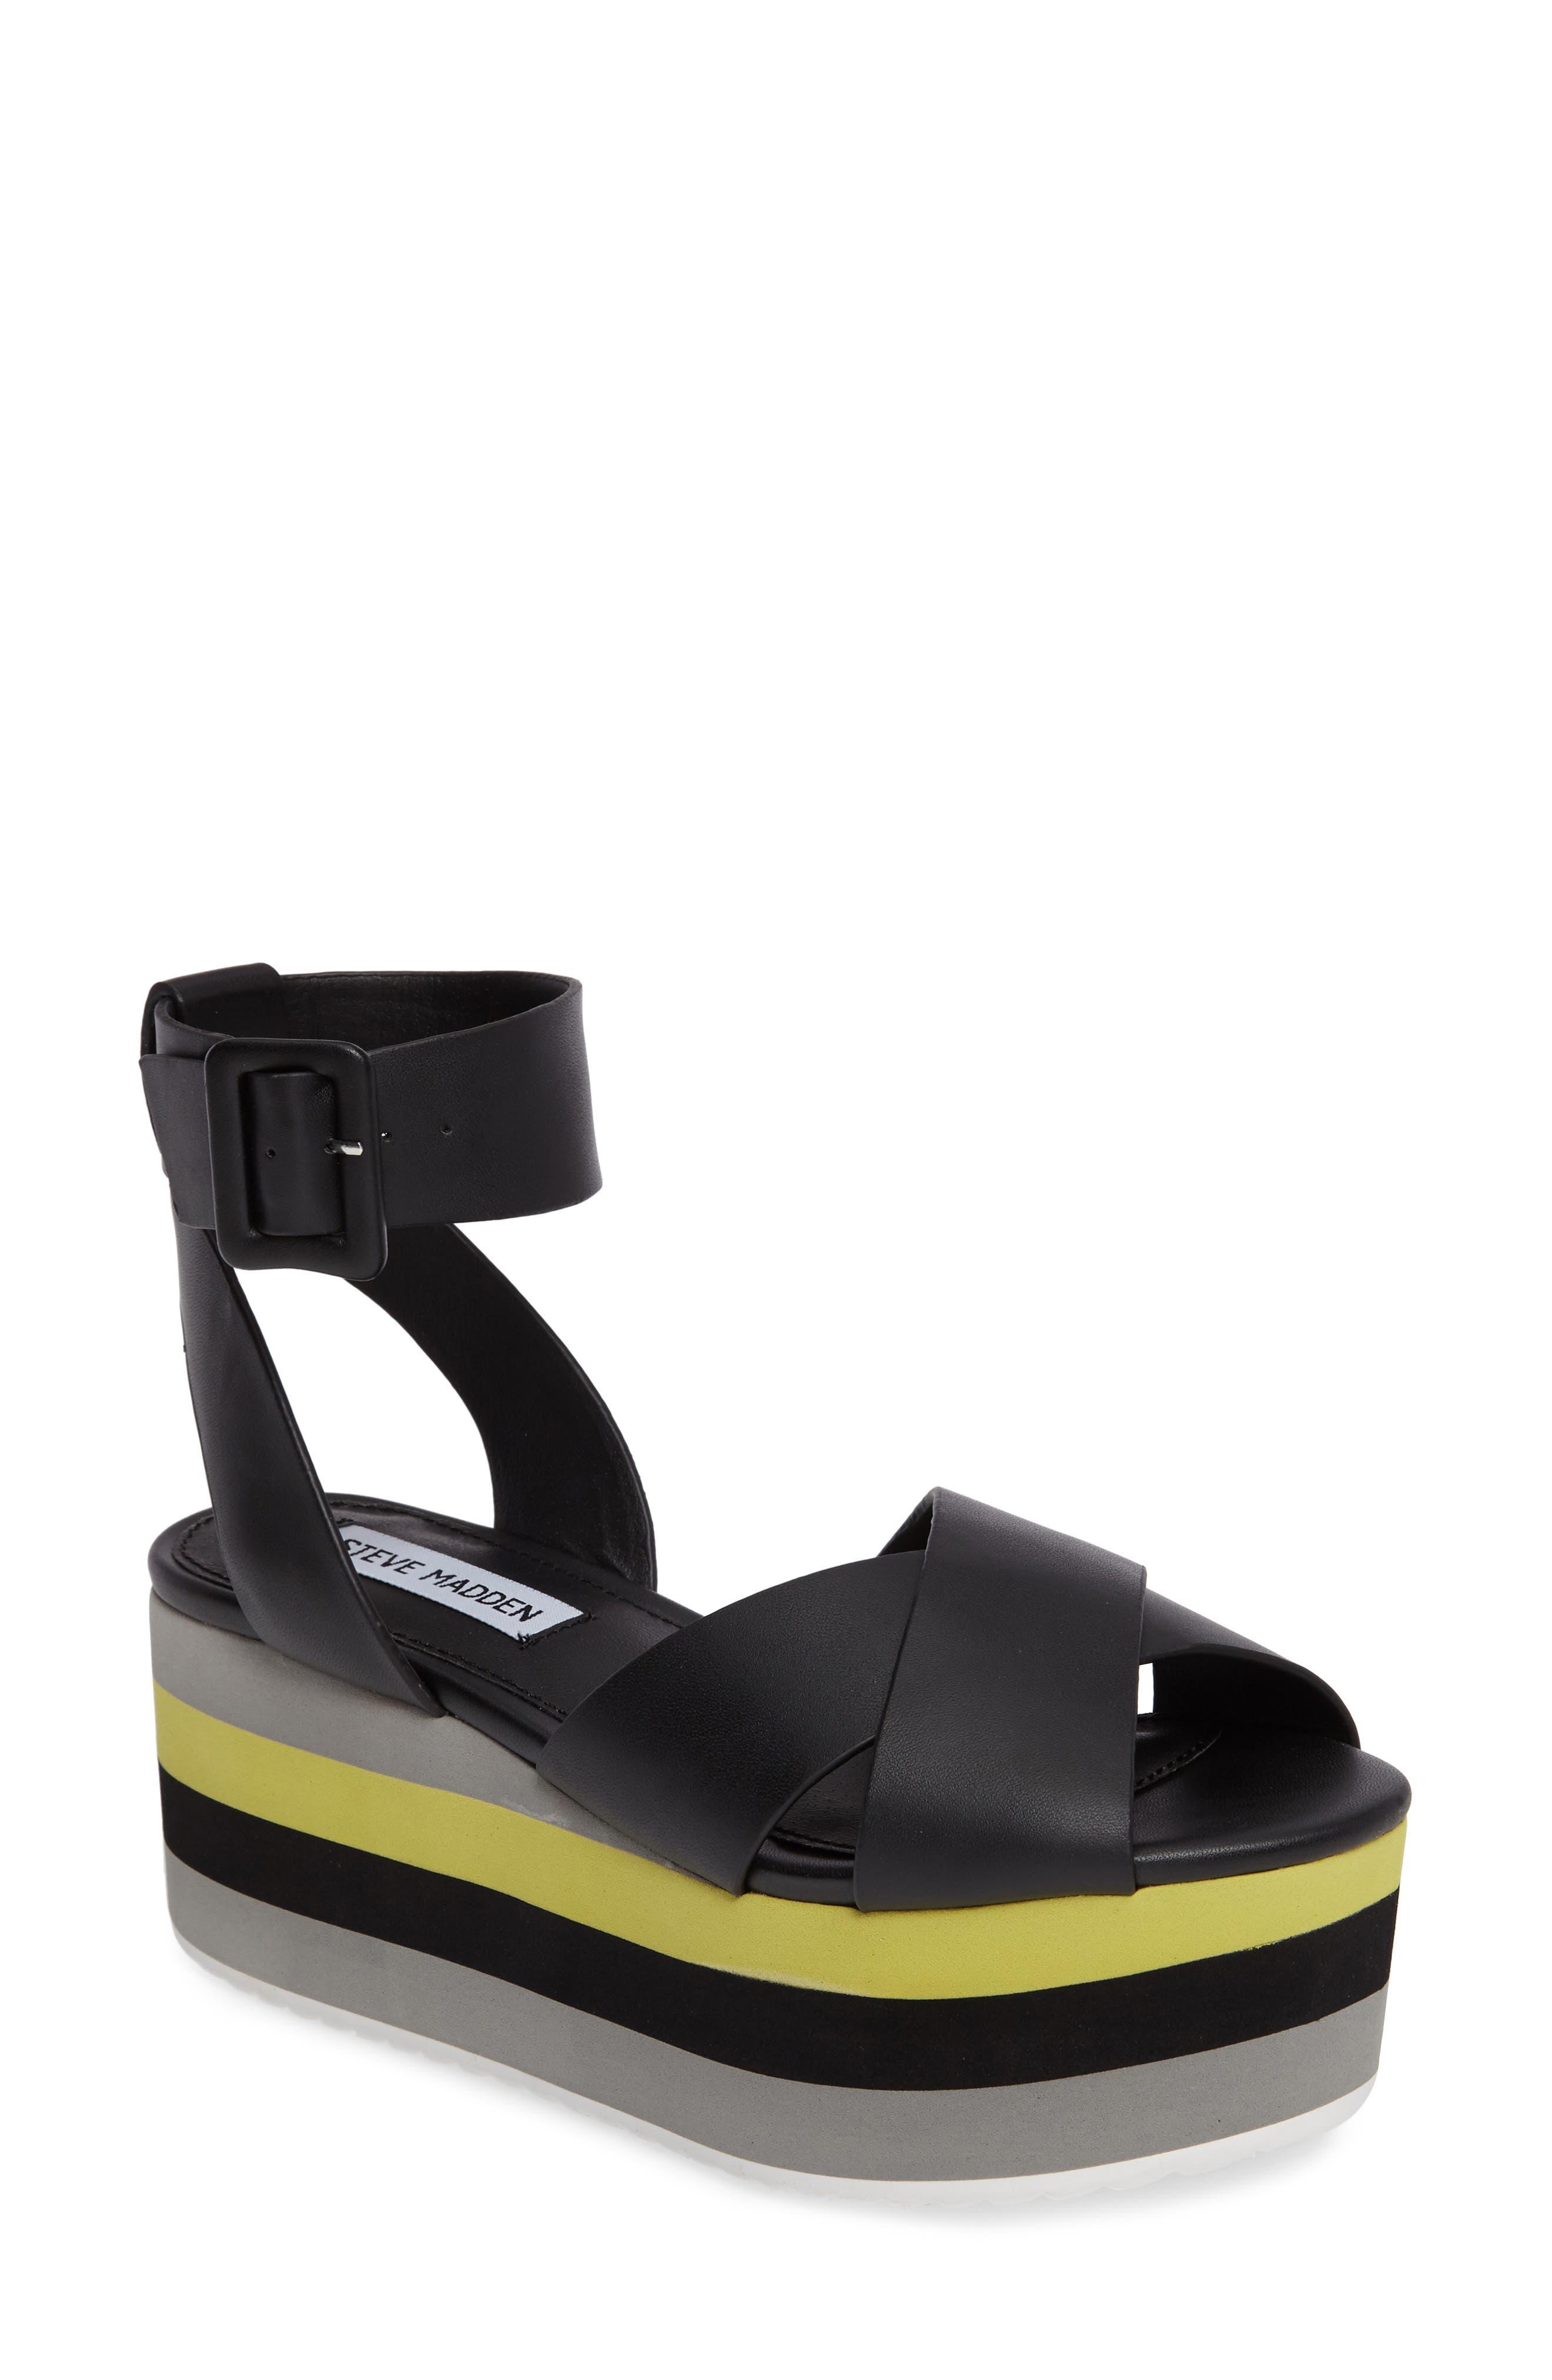 Macer Cuffed Platform Sandal,                             Main thumbnail 1, color,                             015